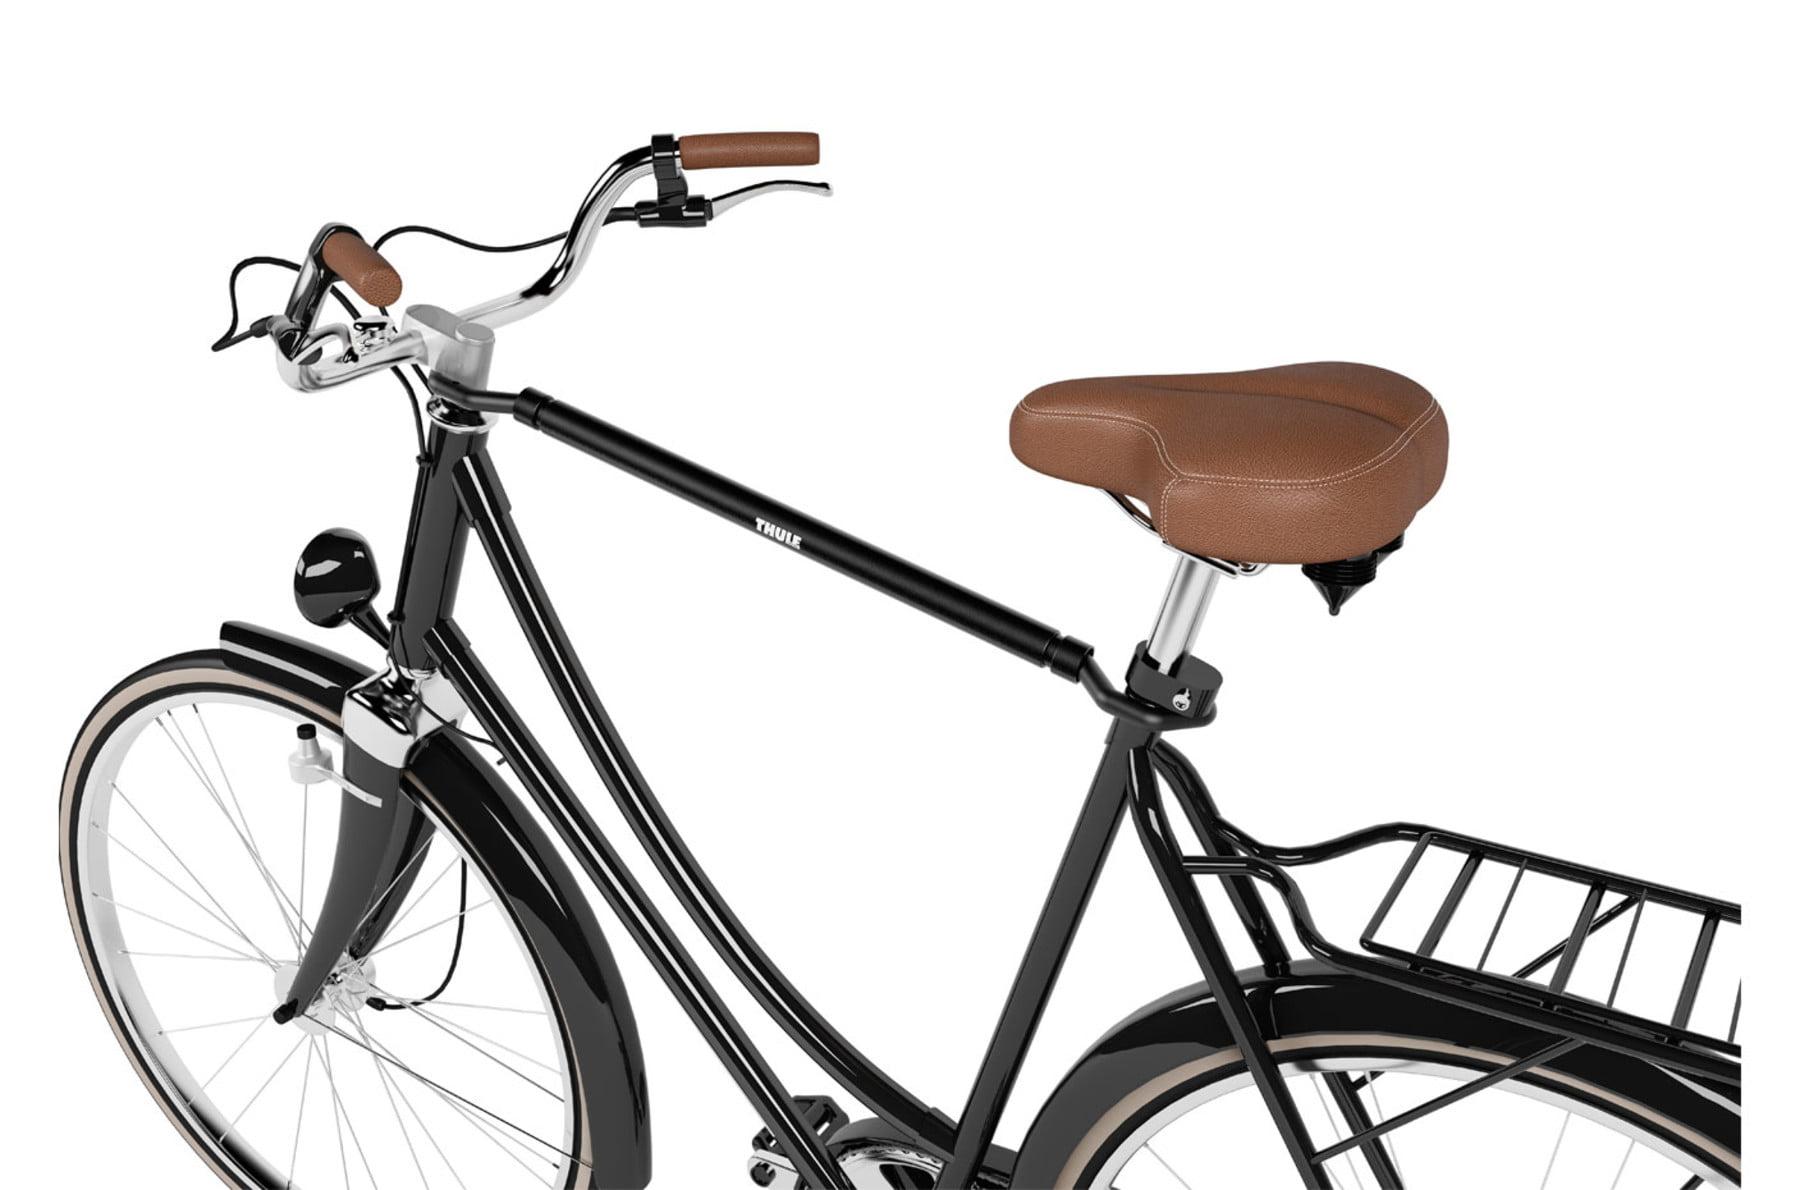 Thule Bike Frame Adapter 982 2